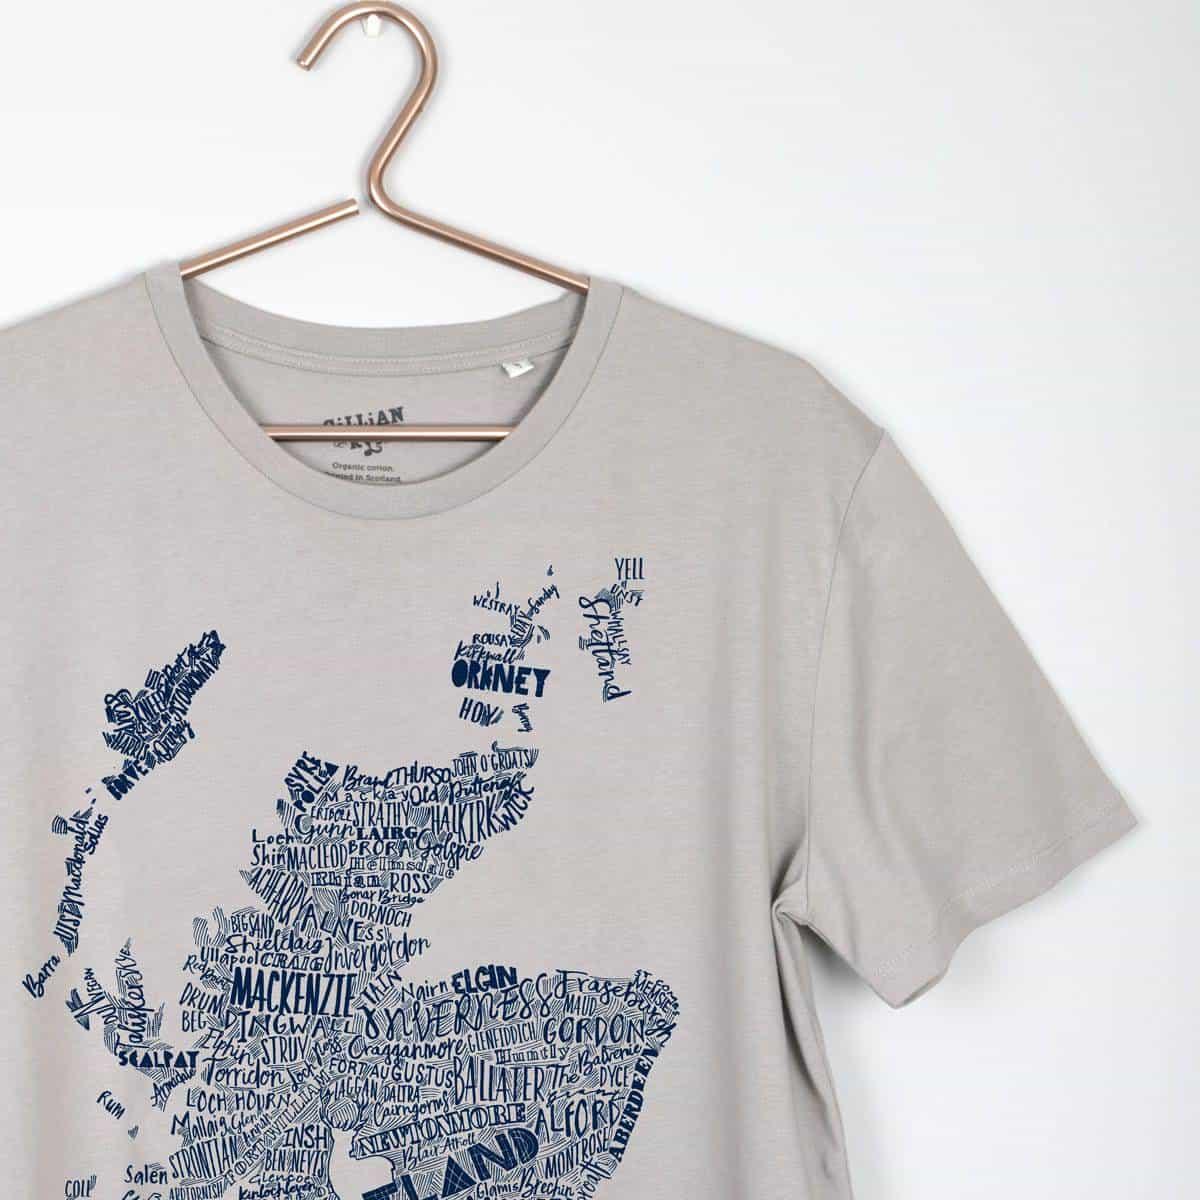 8d2a0e2e221 Gillian Kyle Scottish Clothing Scotland Map Mens Tee Shirt Grey